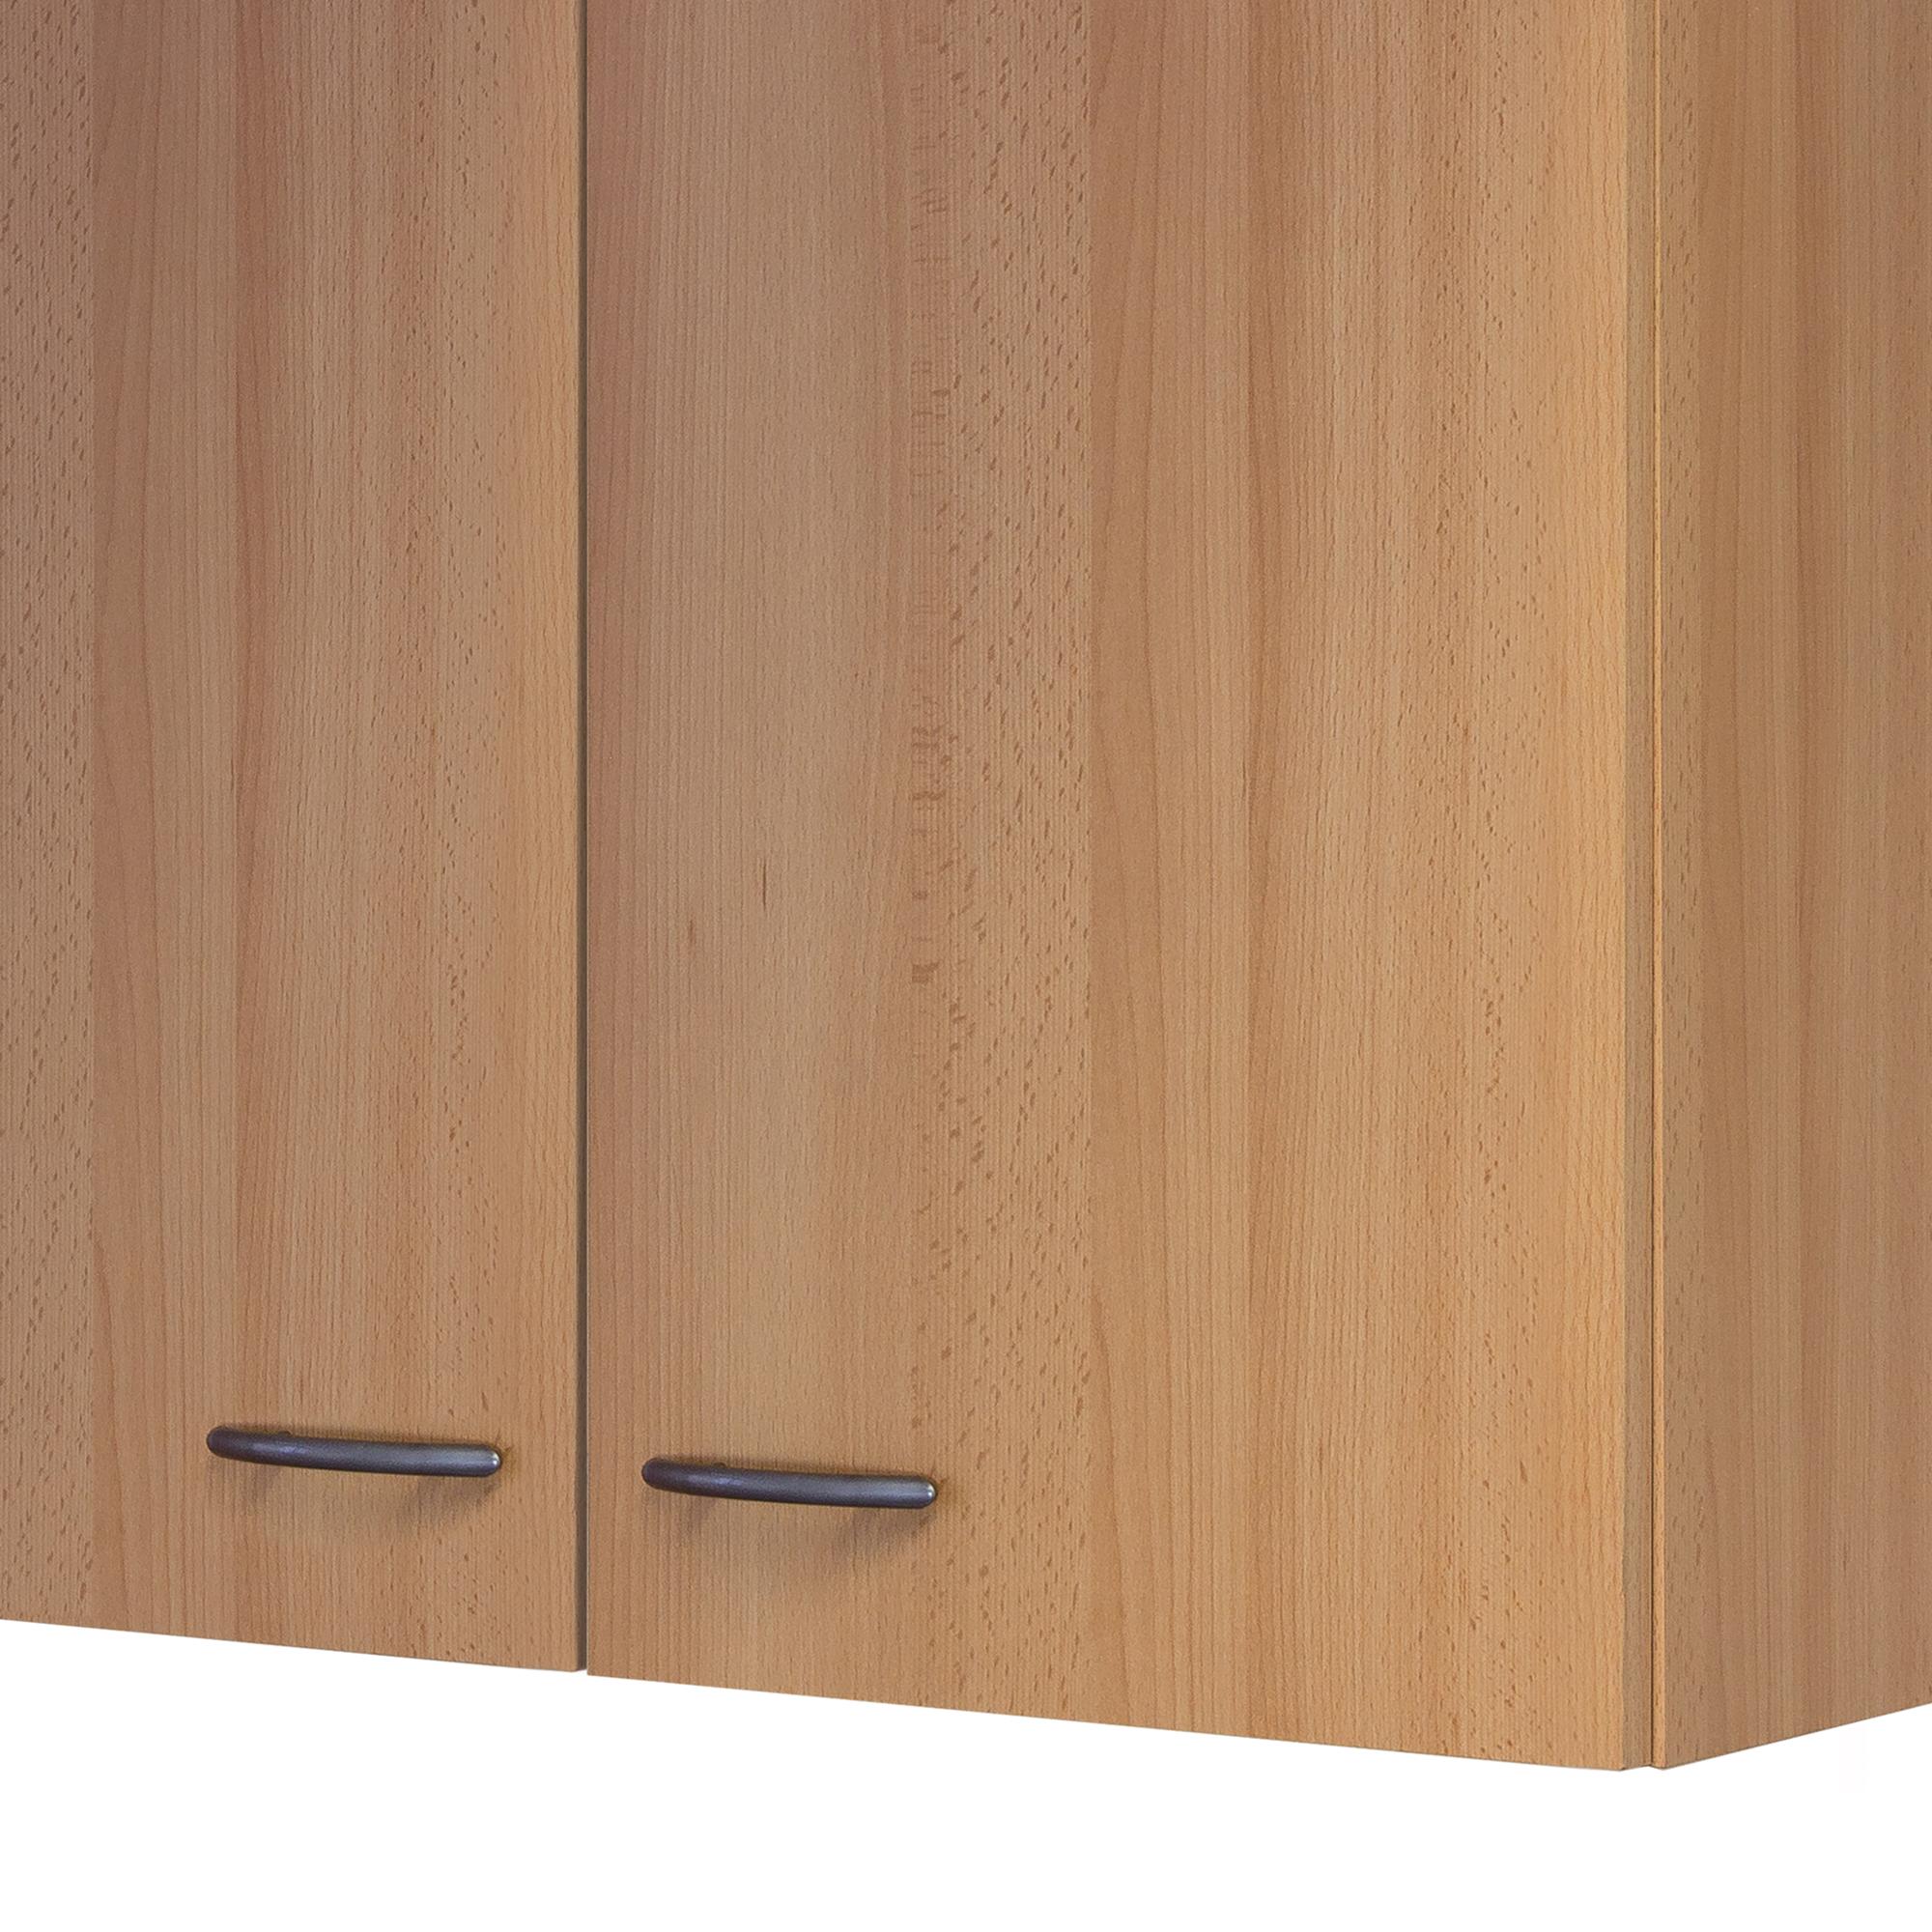 k chen h ngeschrank nano 2 t rig 80 cm breit buche k che h ngeschr nke. Black Bedroom Furniture Sets. Home Design Ideas